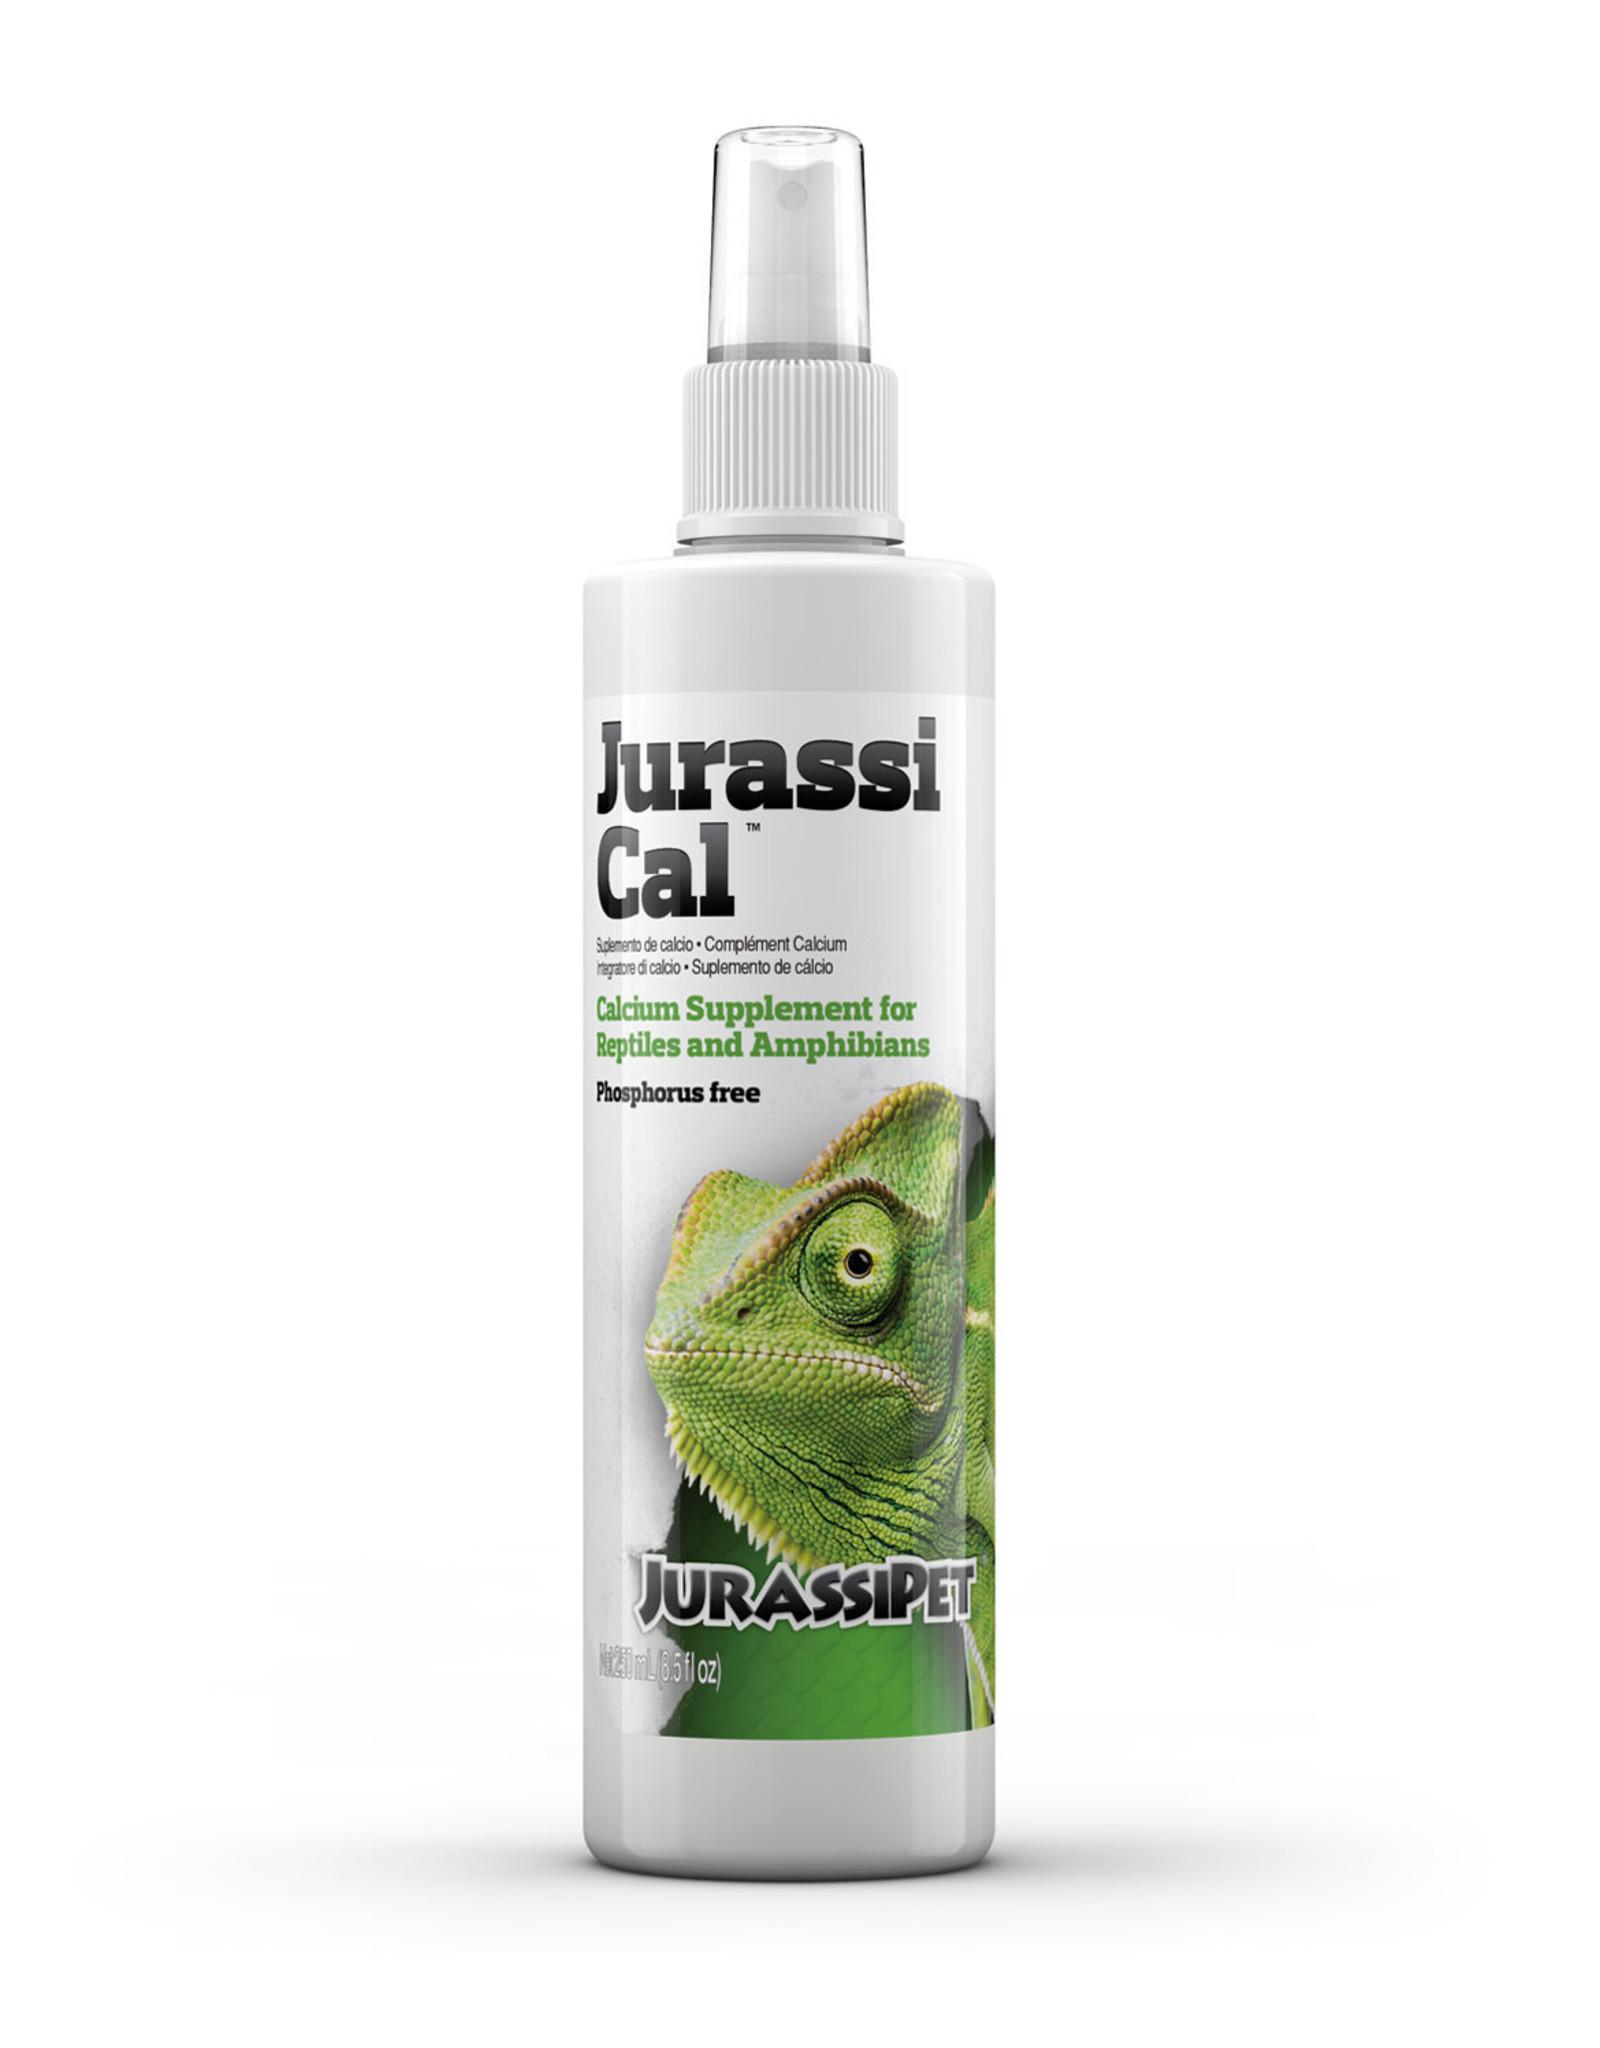 JurassiPet JURASSIPET JurassiCal Liquid Calcium Supplement 250ml